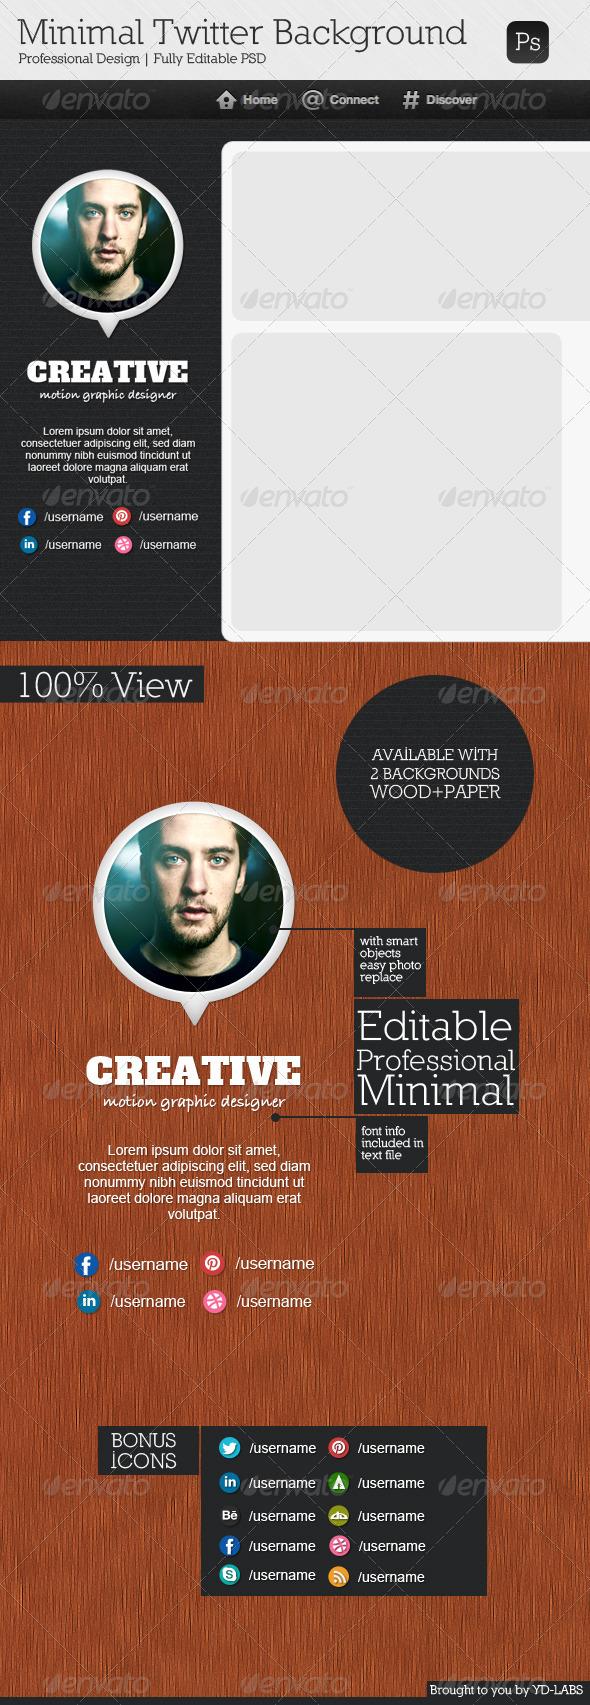 GraphicRiver Minimal Twitter Background V7 3791160